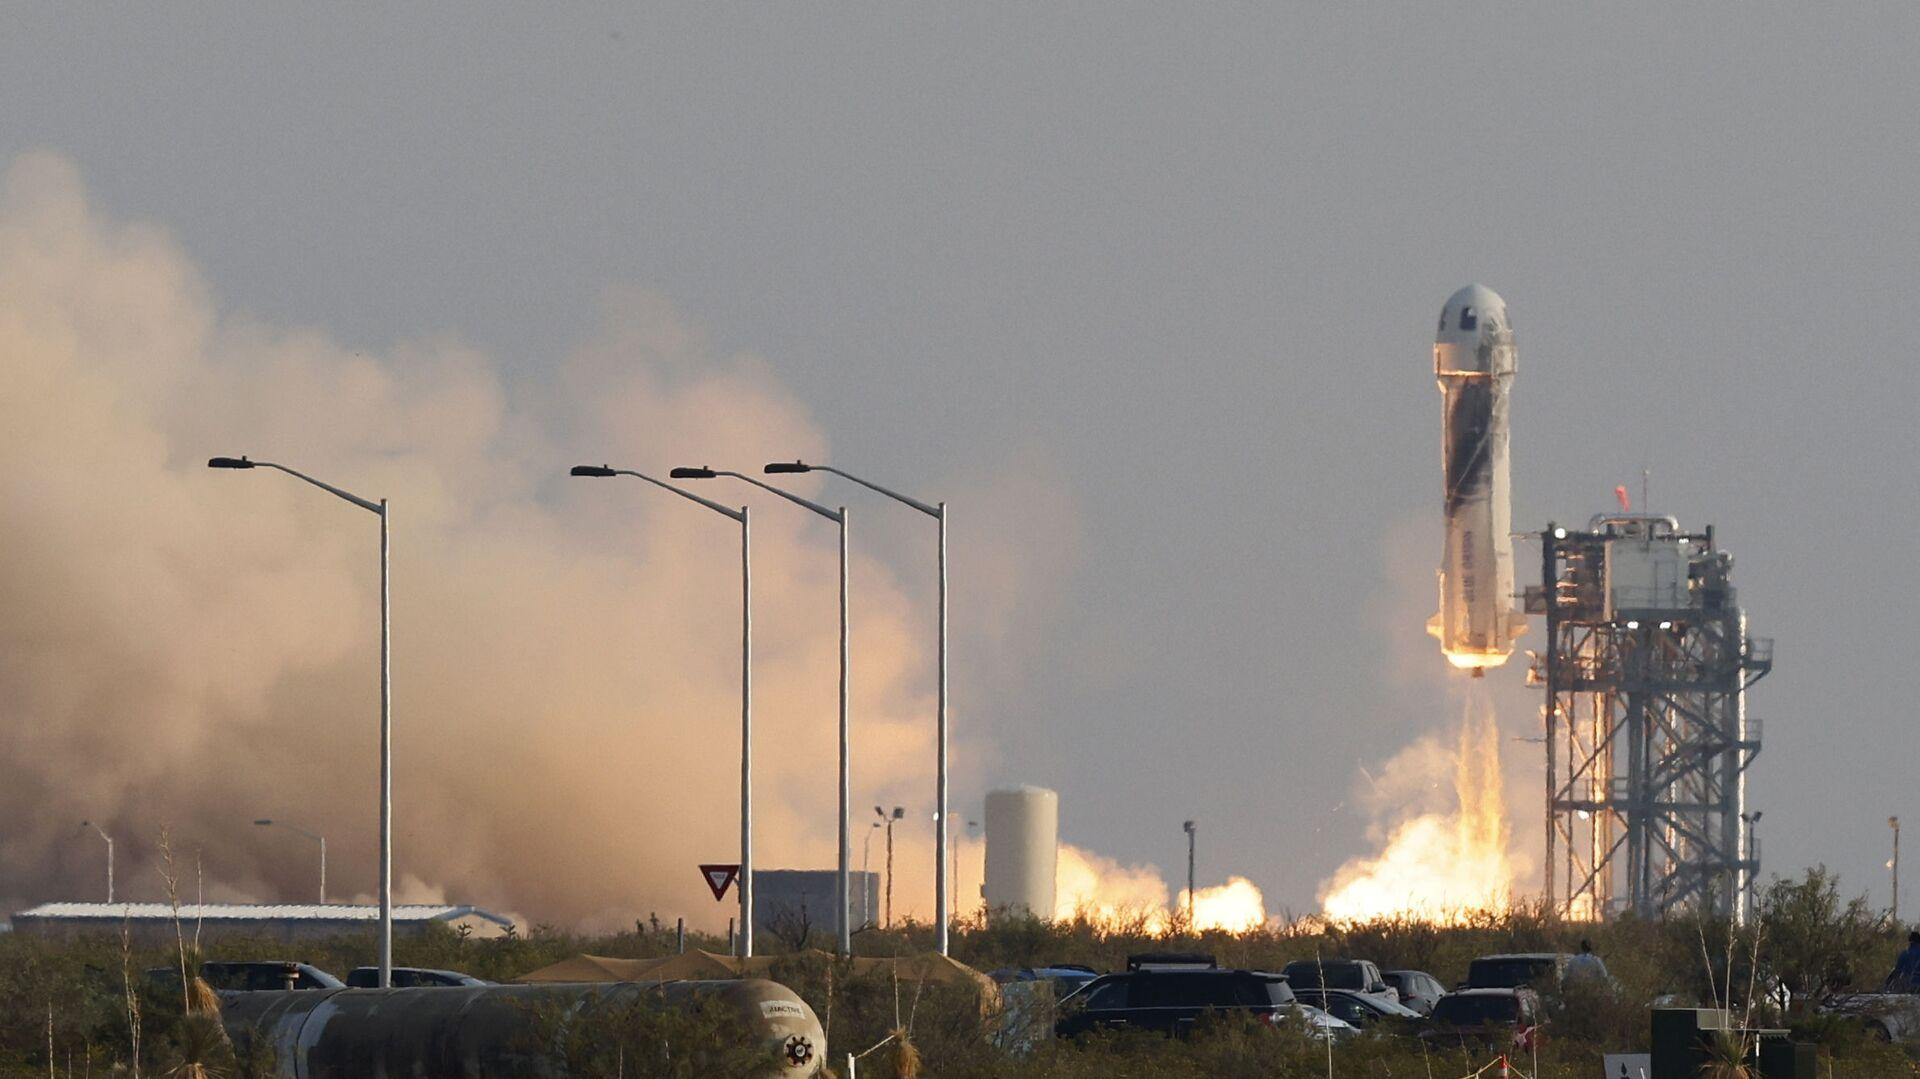 Billionaire businessman Jeff Bezos is launched with three crew members aboard a New Shepard rocket on the world's first unpiloted suborbital flight from Blue Origin's Launch Site 1 near Van Horn, Texas , U.S., July 20, 2021 - Sputnik International, 1920, 25.09.2021